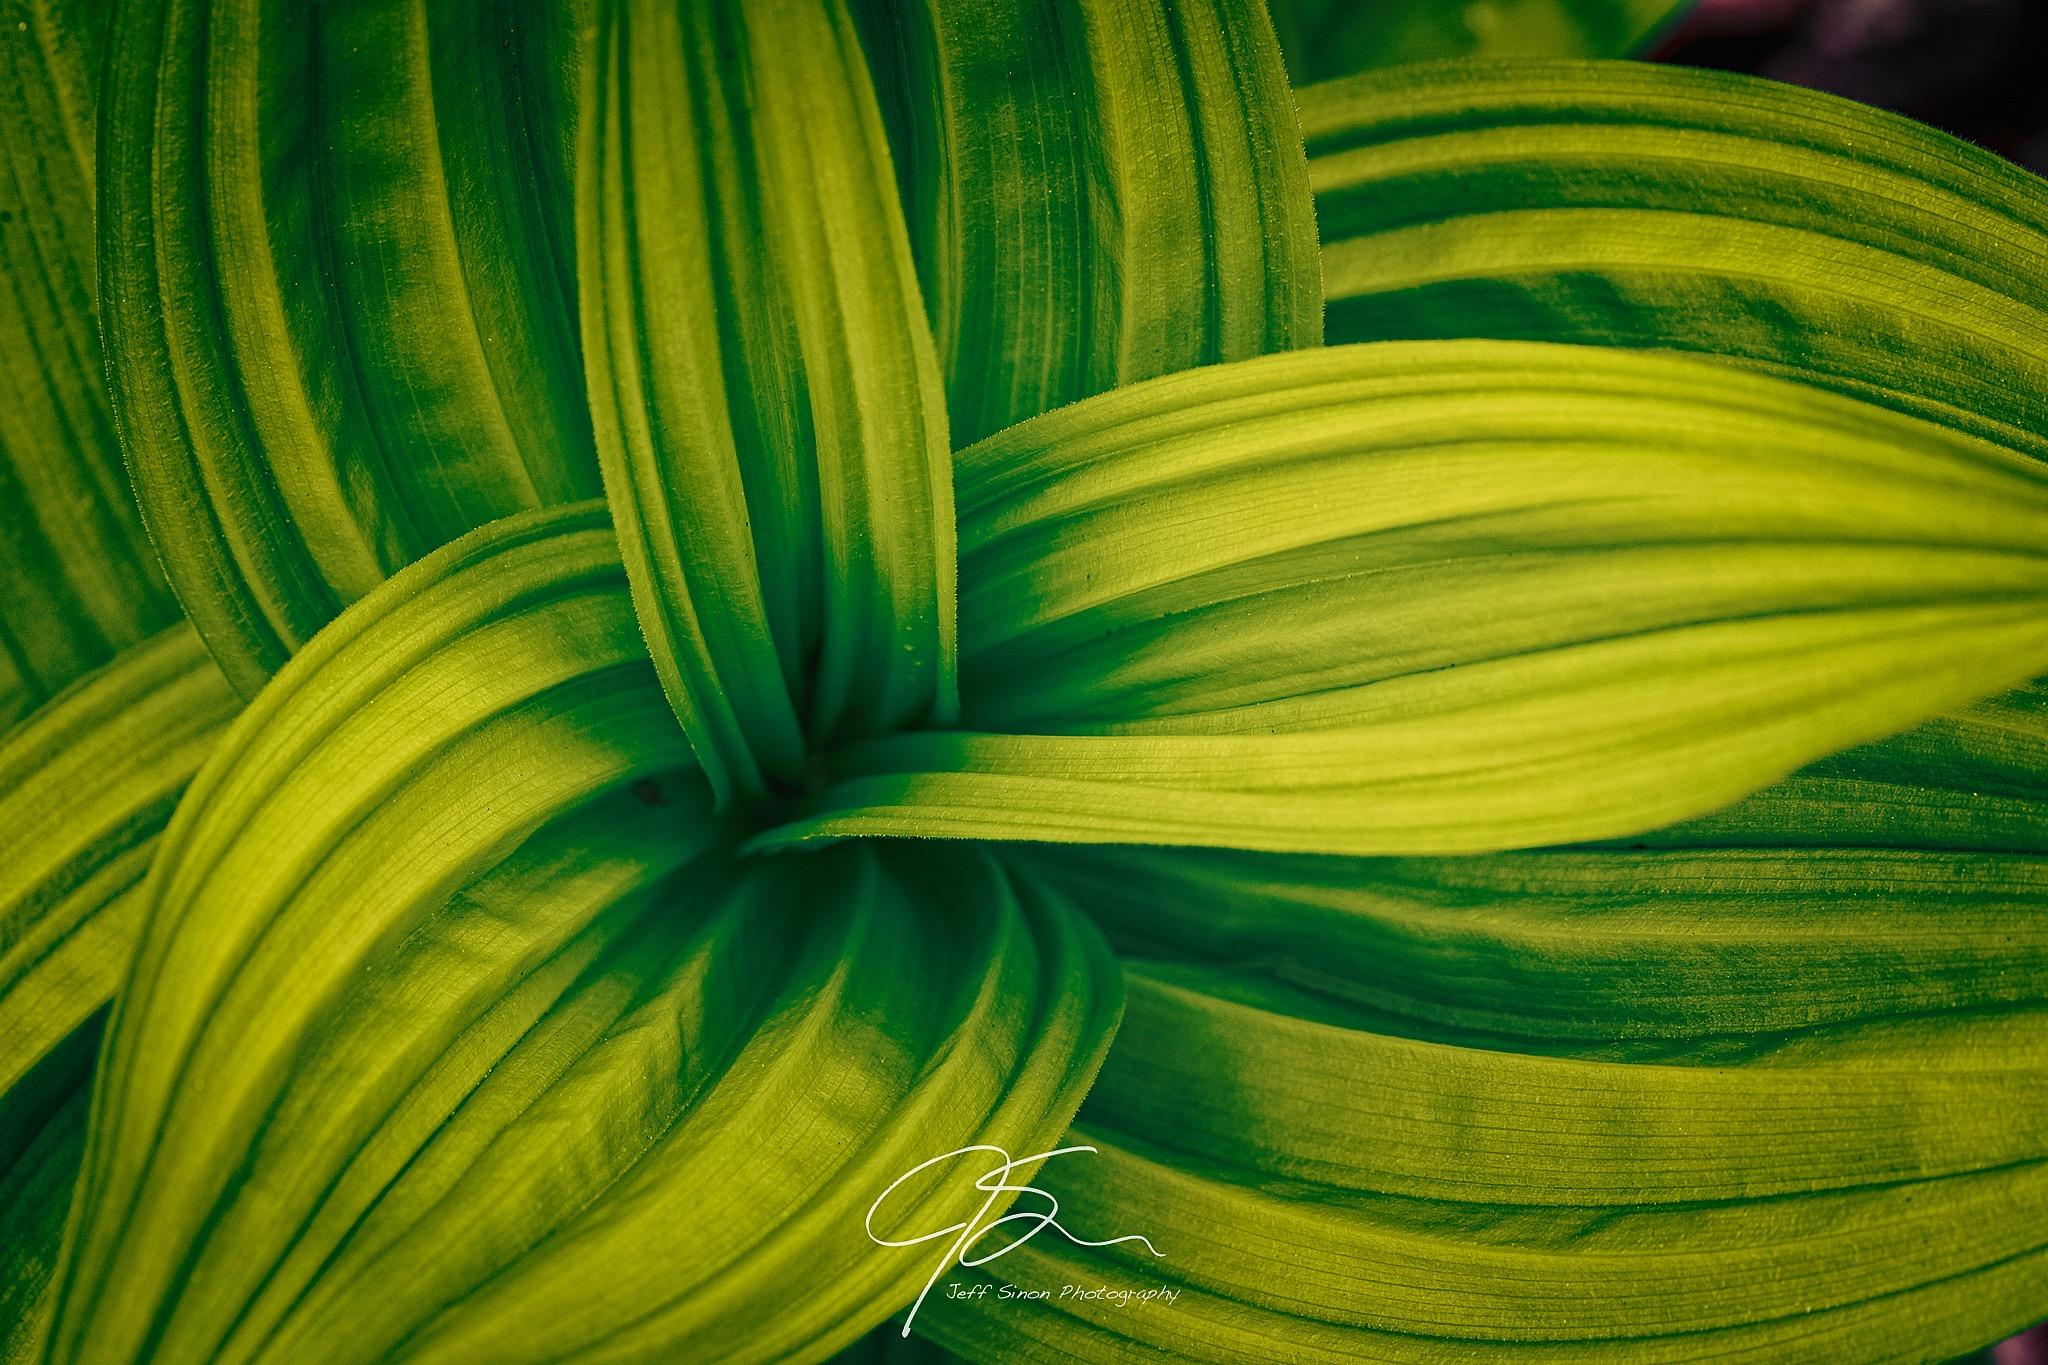 wavy green leaves of false hellebore.